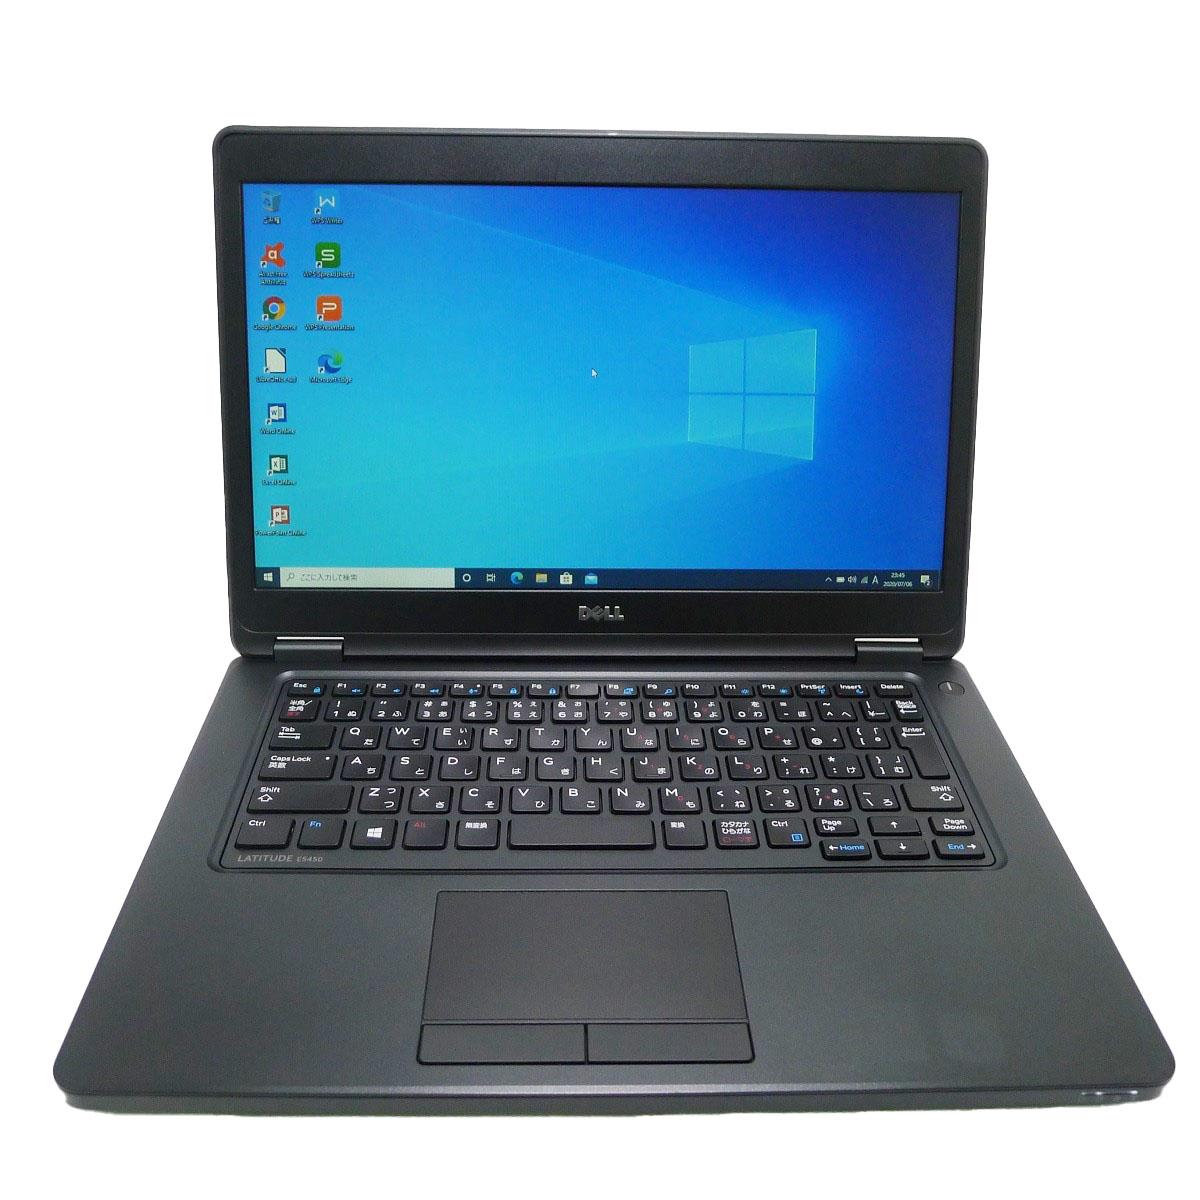 DELL Latitude E5450 Core 期間限定特価品 i5 16GB HDD250GB 無線LAN Windows10 64bitWPSOffice 高品質 HD ノートパソコン 中古パソコン 中古 14.0インチ